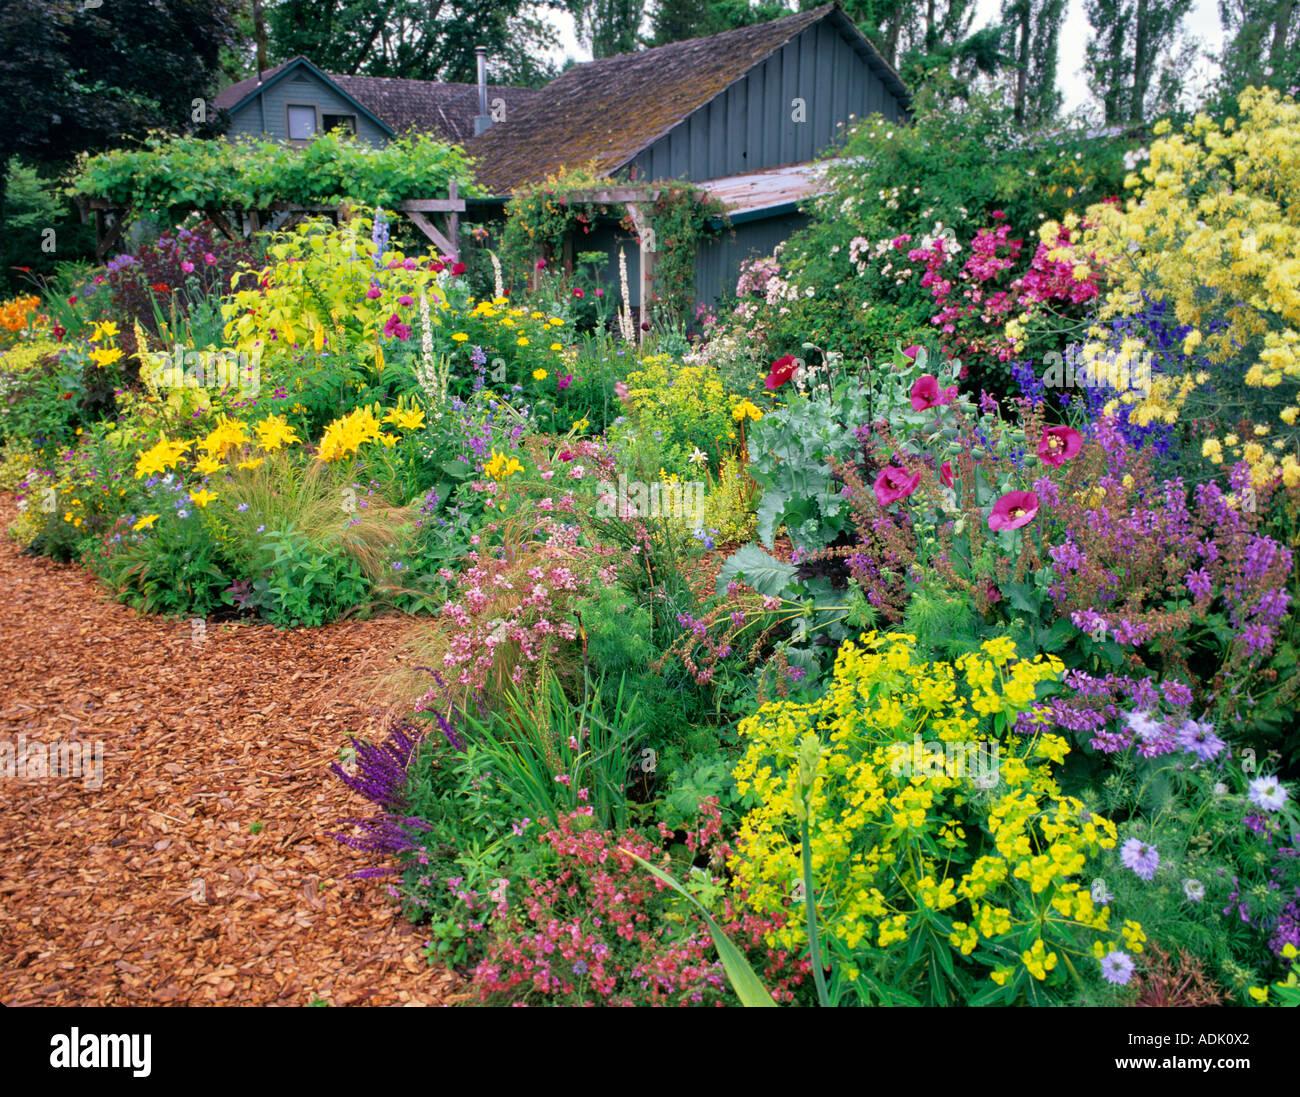 C8.alamy.com/comp/ADK0X2/flower Gardens At Northwe...